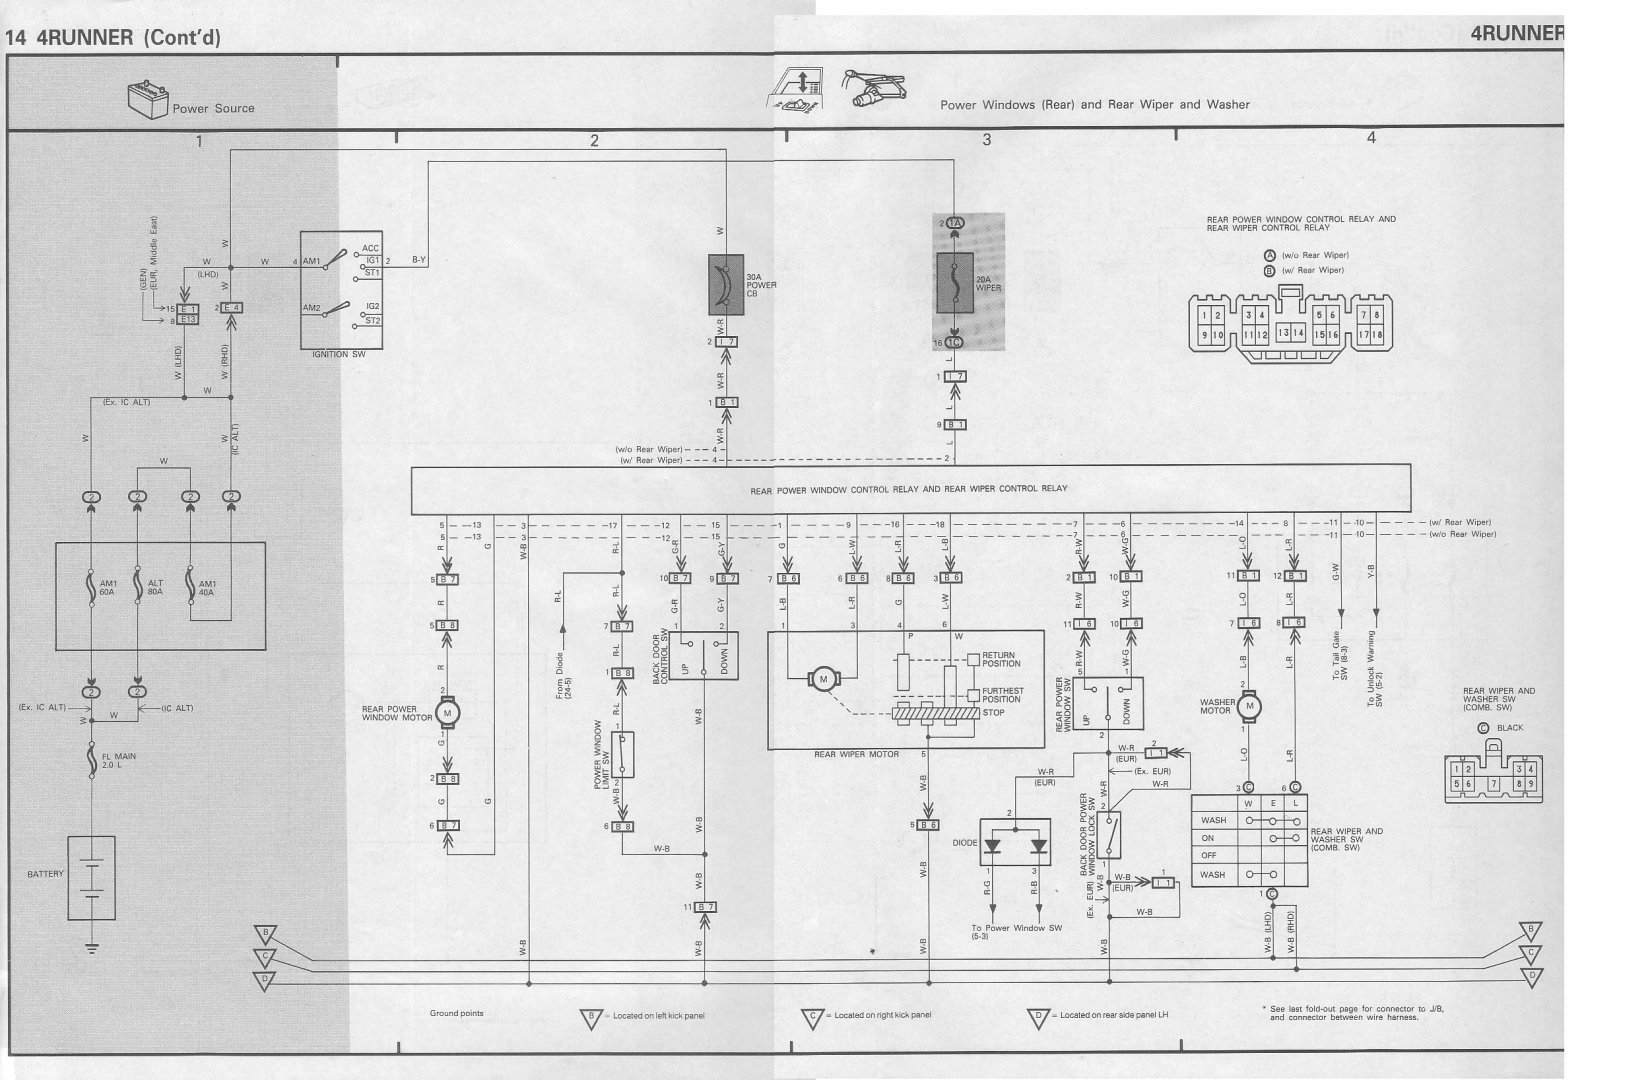 Diagrama ventanas 4Runner.JPG